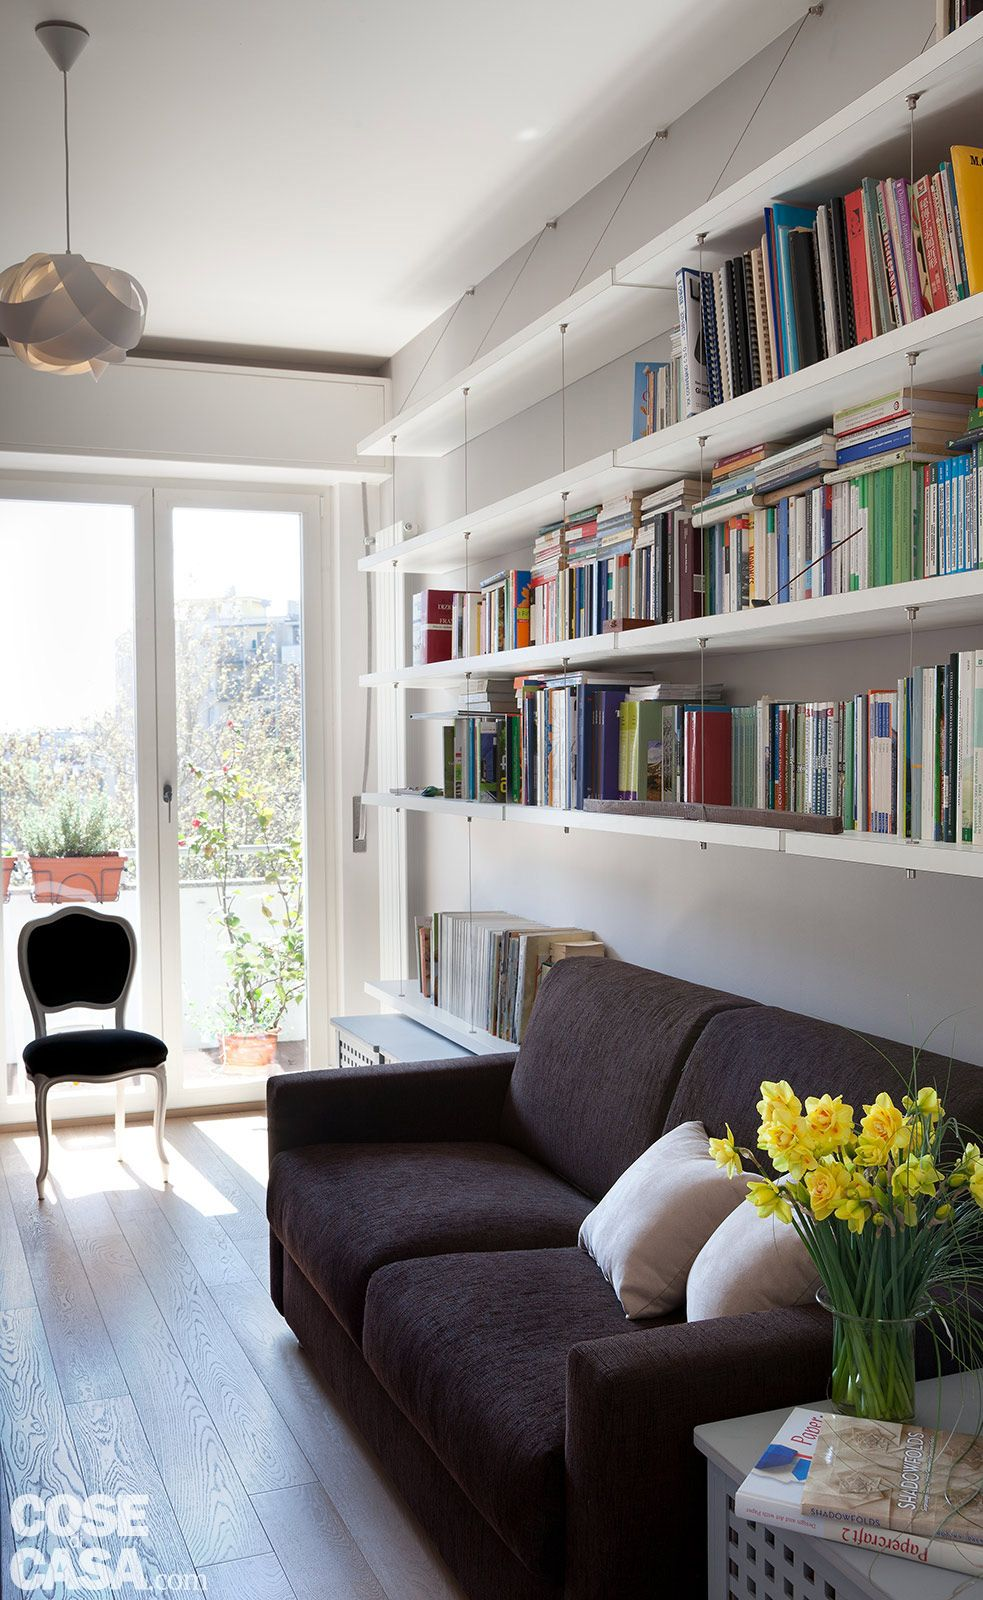 divano libreria a ponte - Cerca con Google | Idee living ...